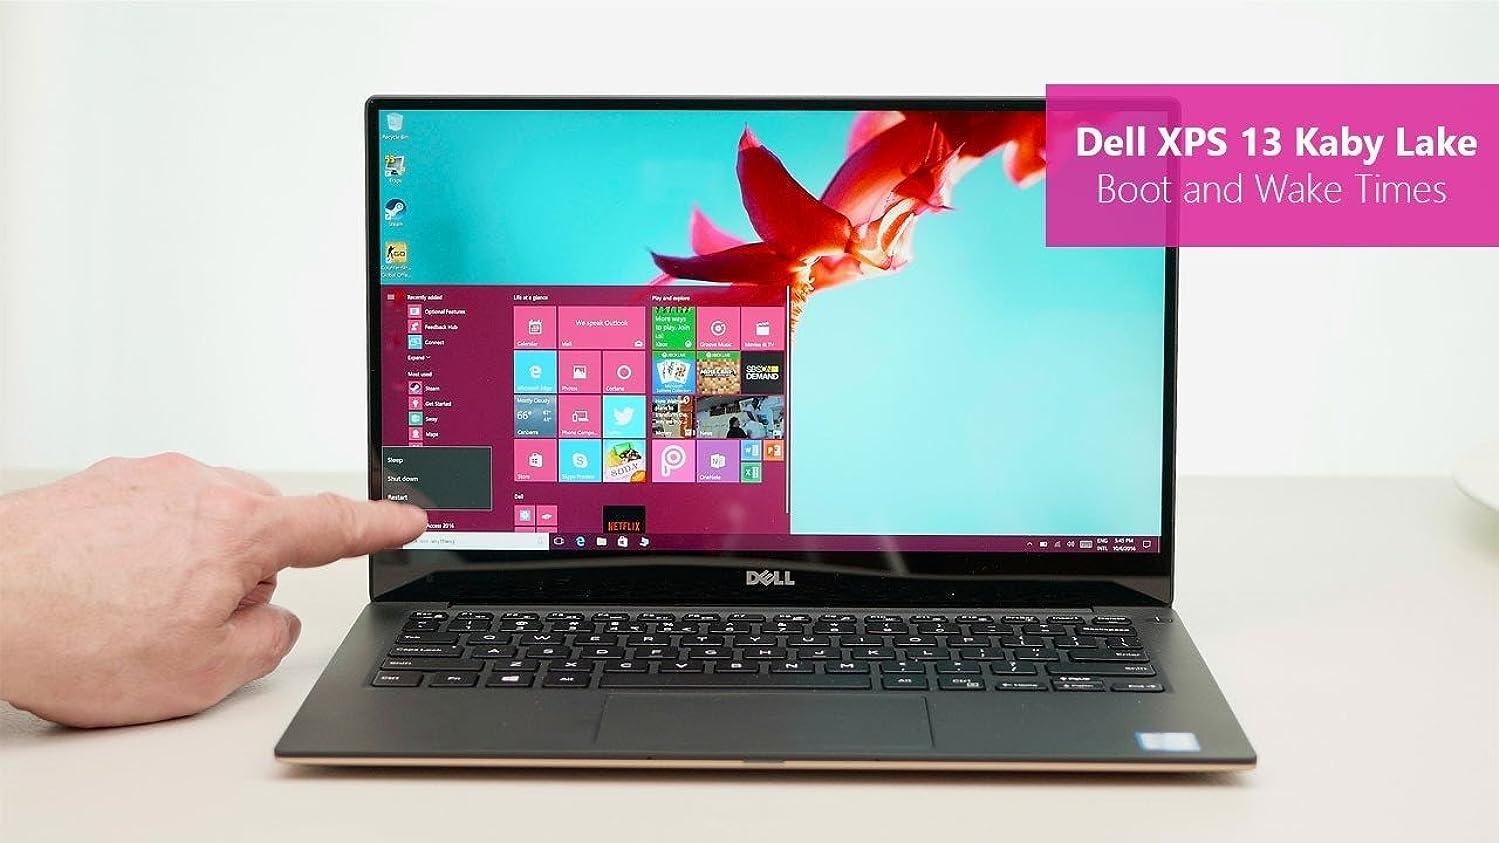 Newest Dell XPS 9350 QHD+ (3200 x 1800) Touch Screen Laptop NoteBook (Intel Core i7-6560U, 16GB Ram, 256GB SSD, Camera, Type C Port) Windows 10 (Renewed)